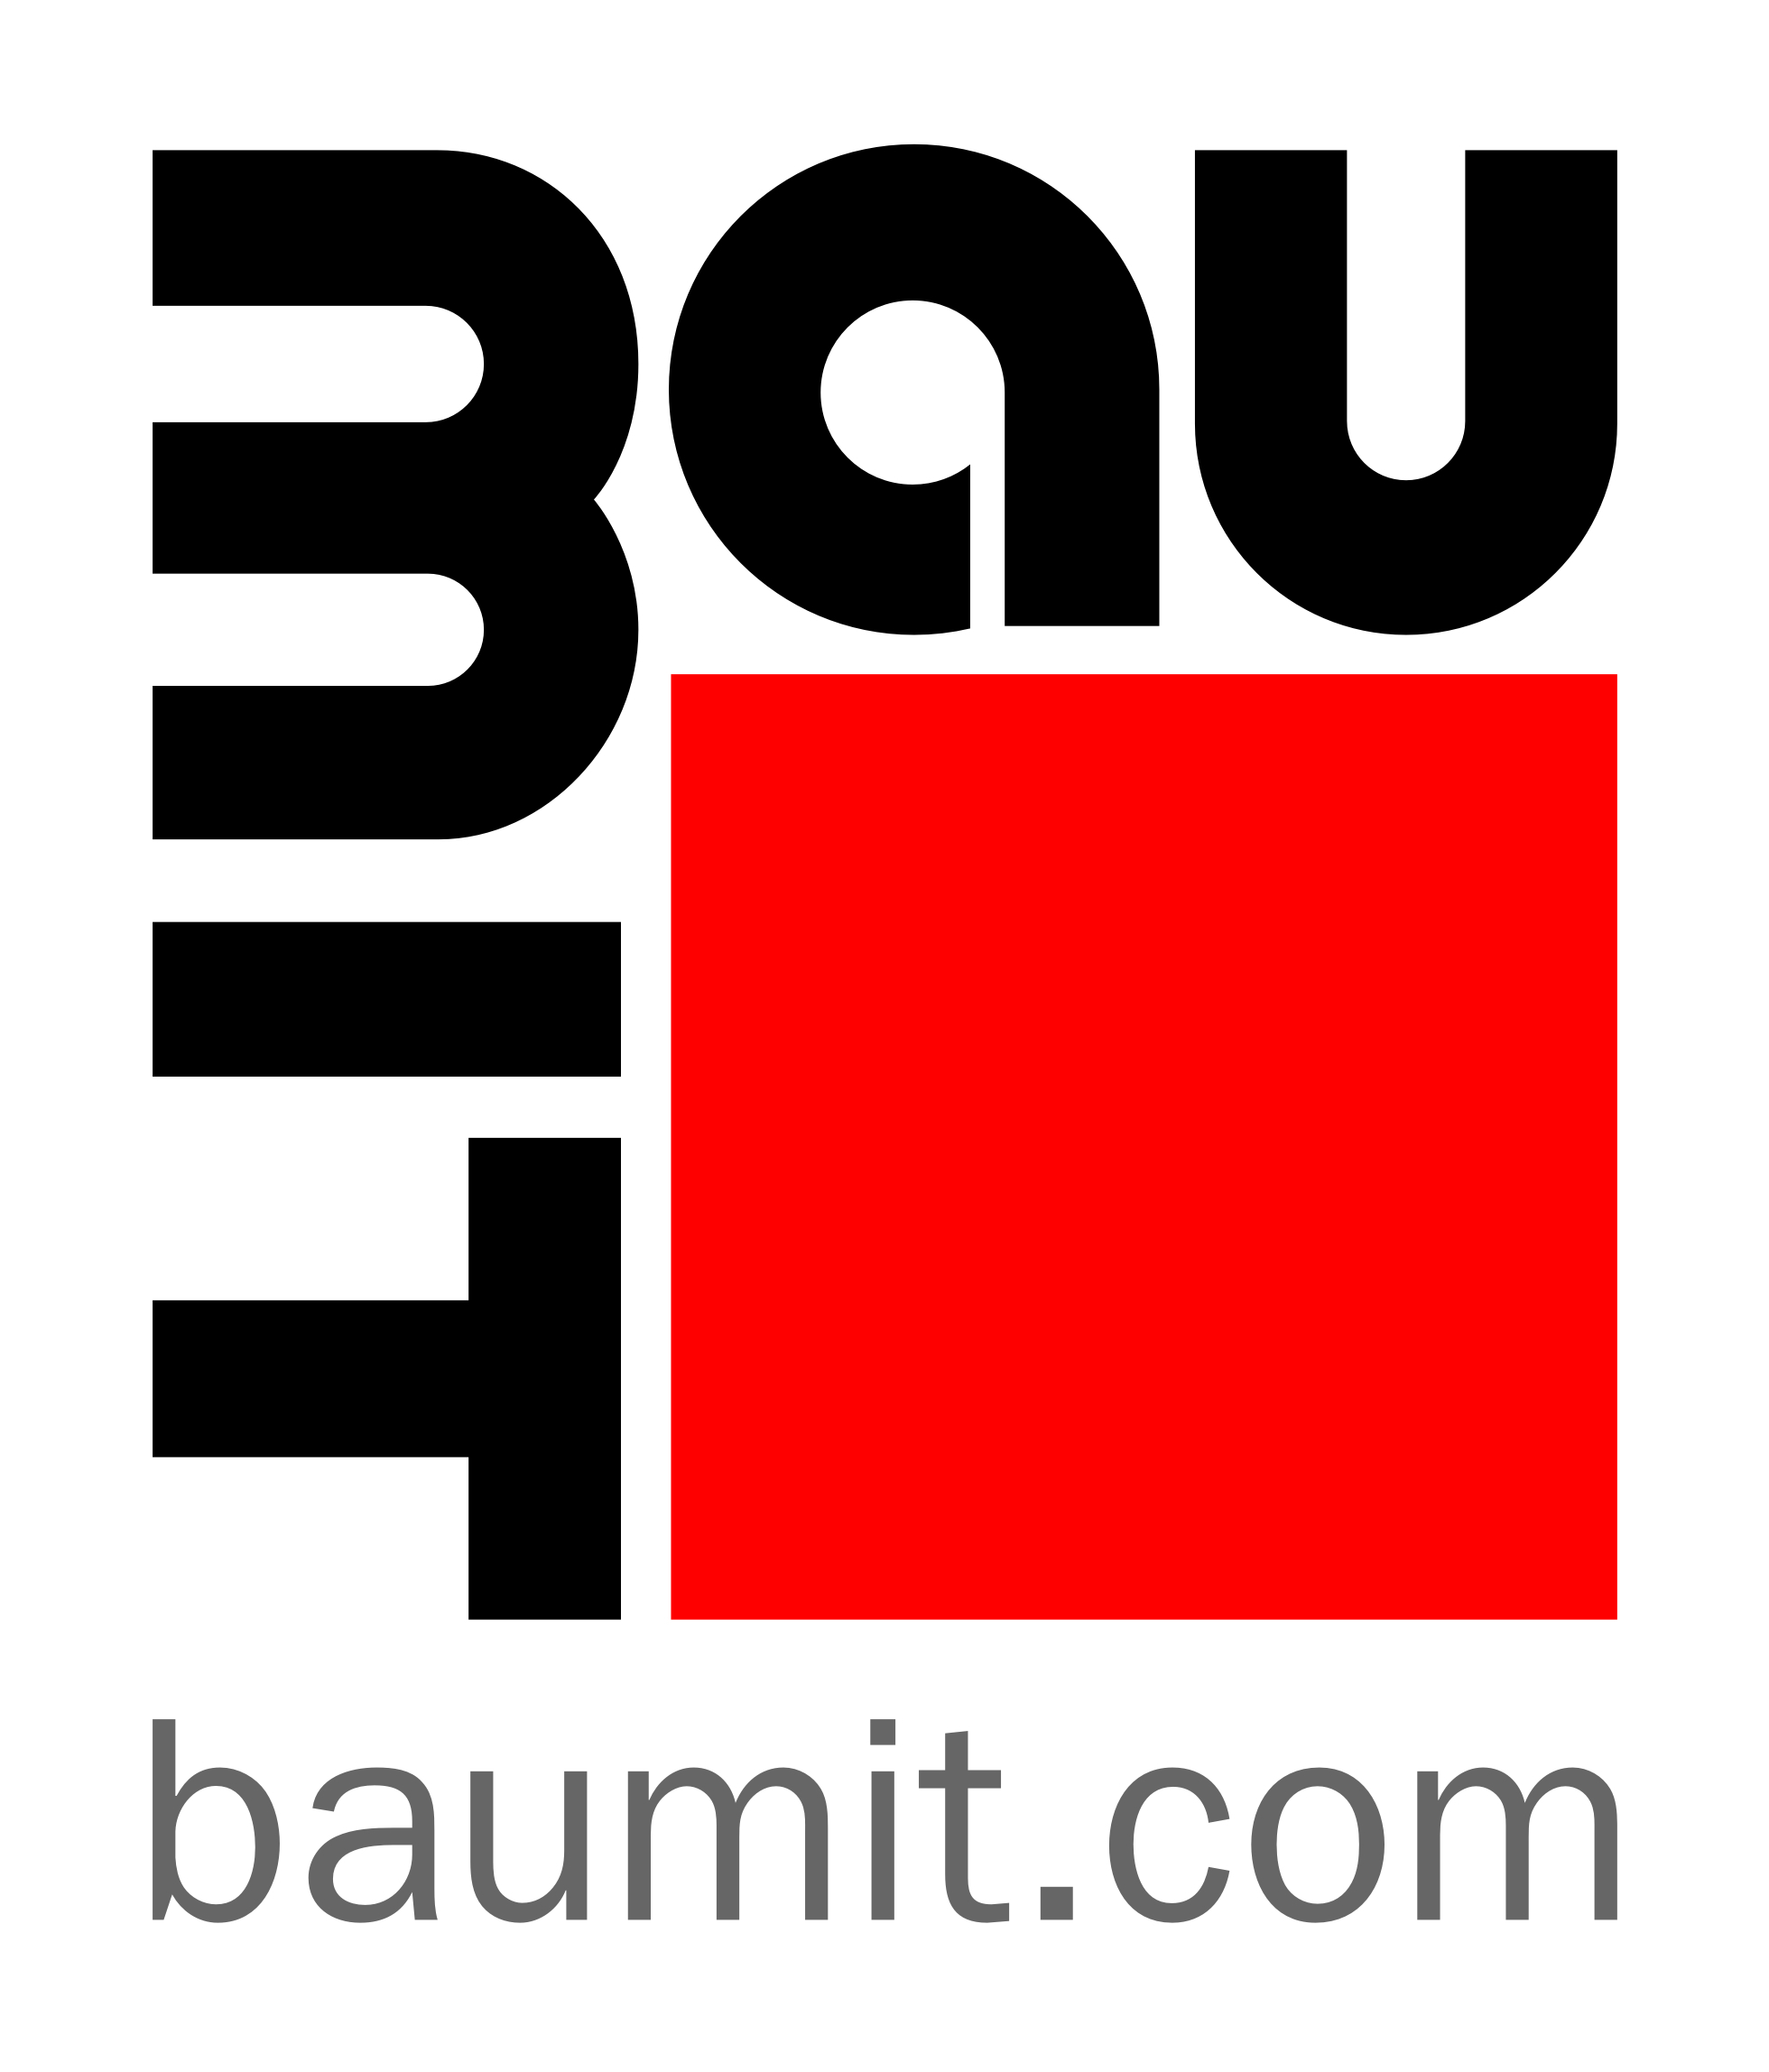 baumit beton b25 25 kg abud materia y budowlane. Black Bedroom Furniture Sets. Home Design Ideas